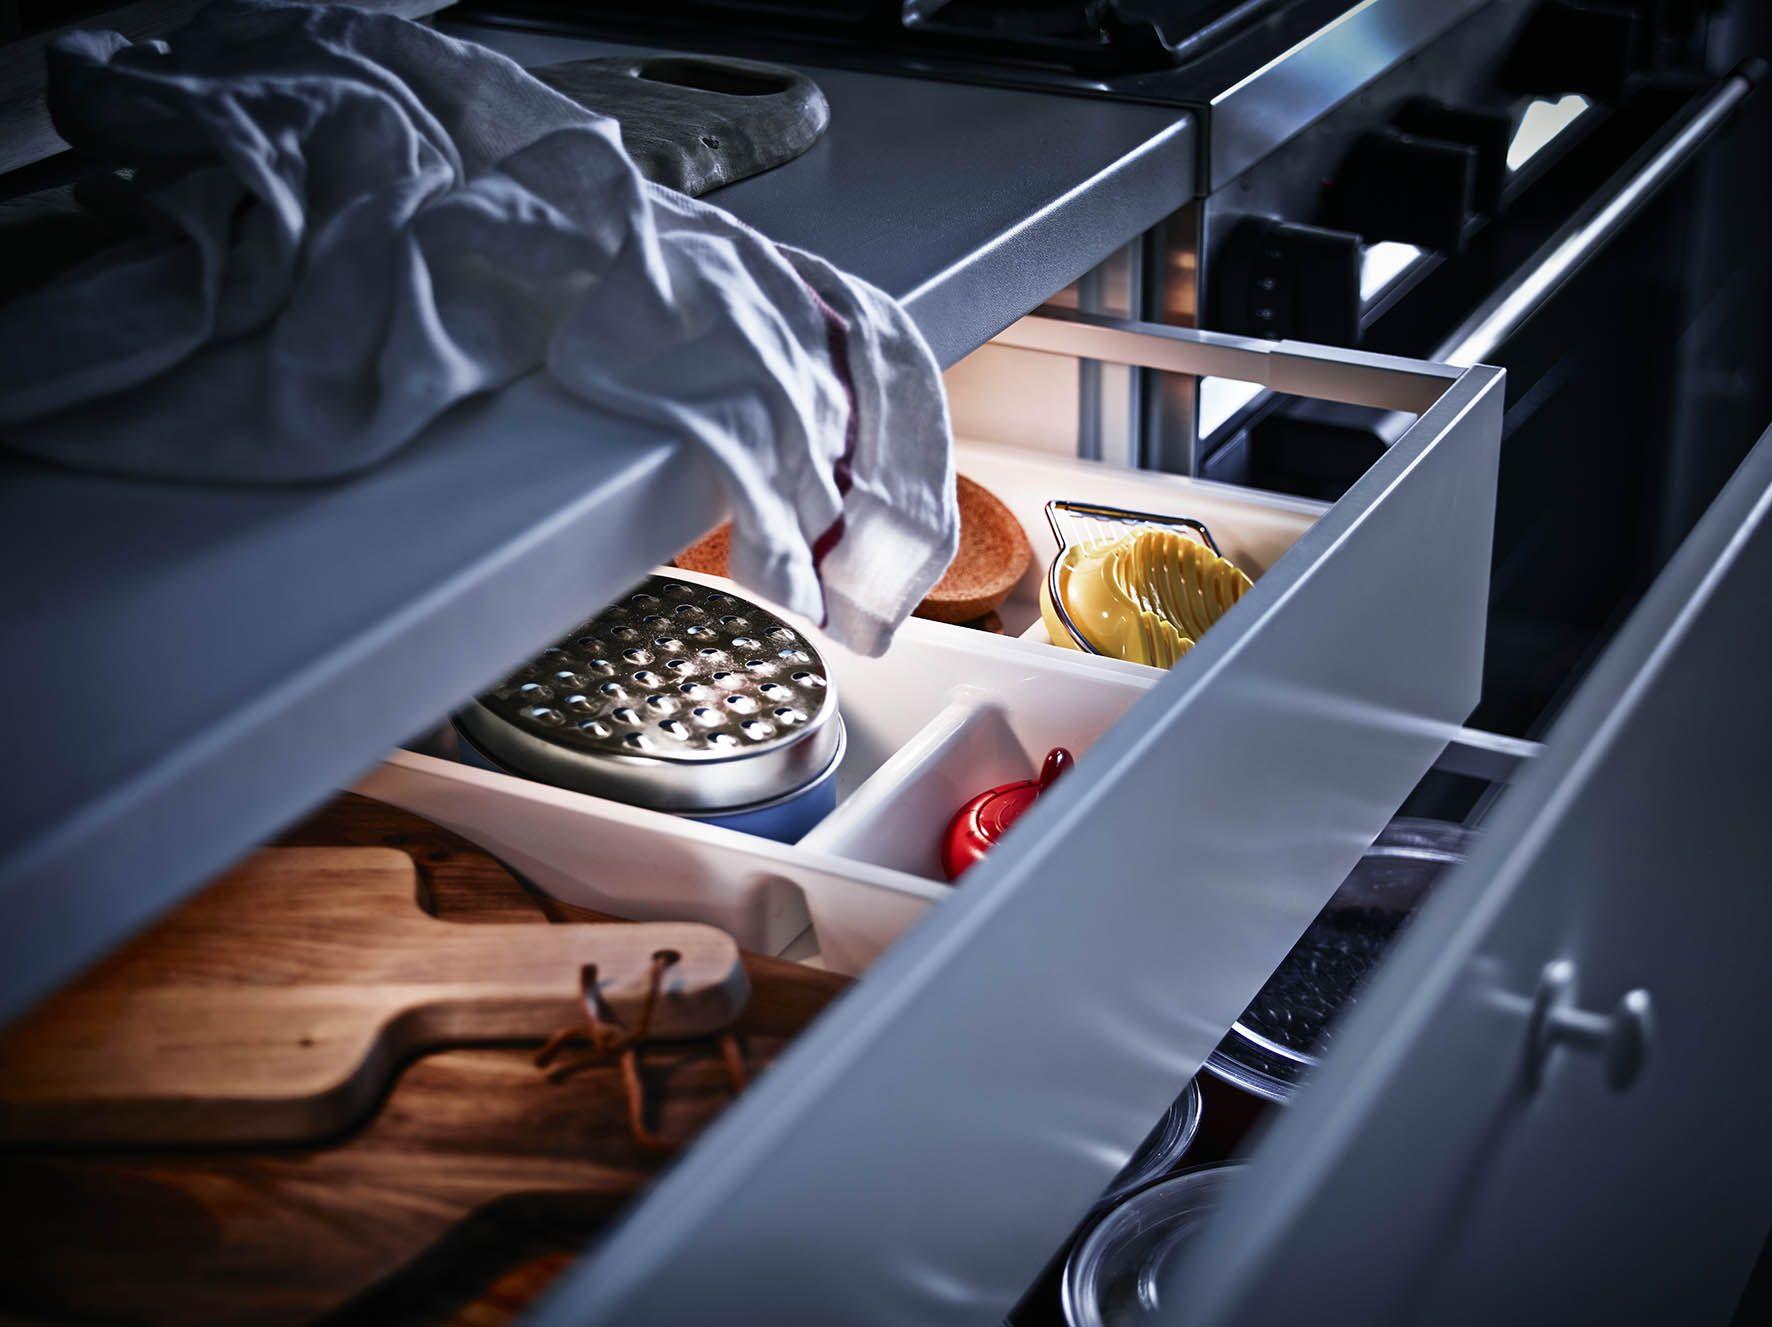 ikea omlopp led verlichting in de lades keuken